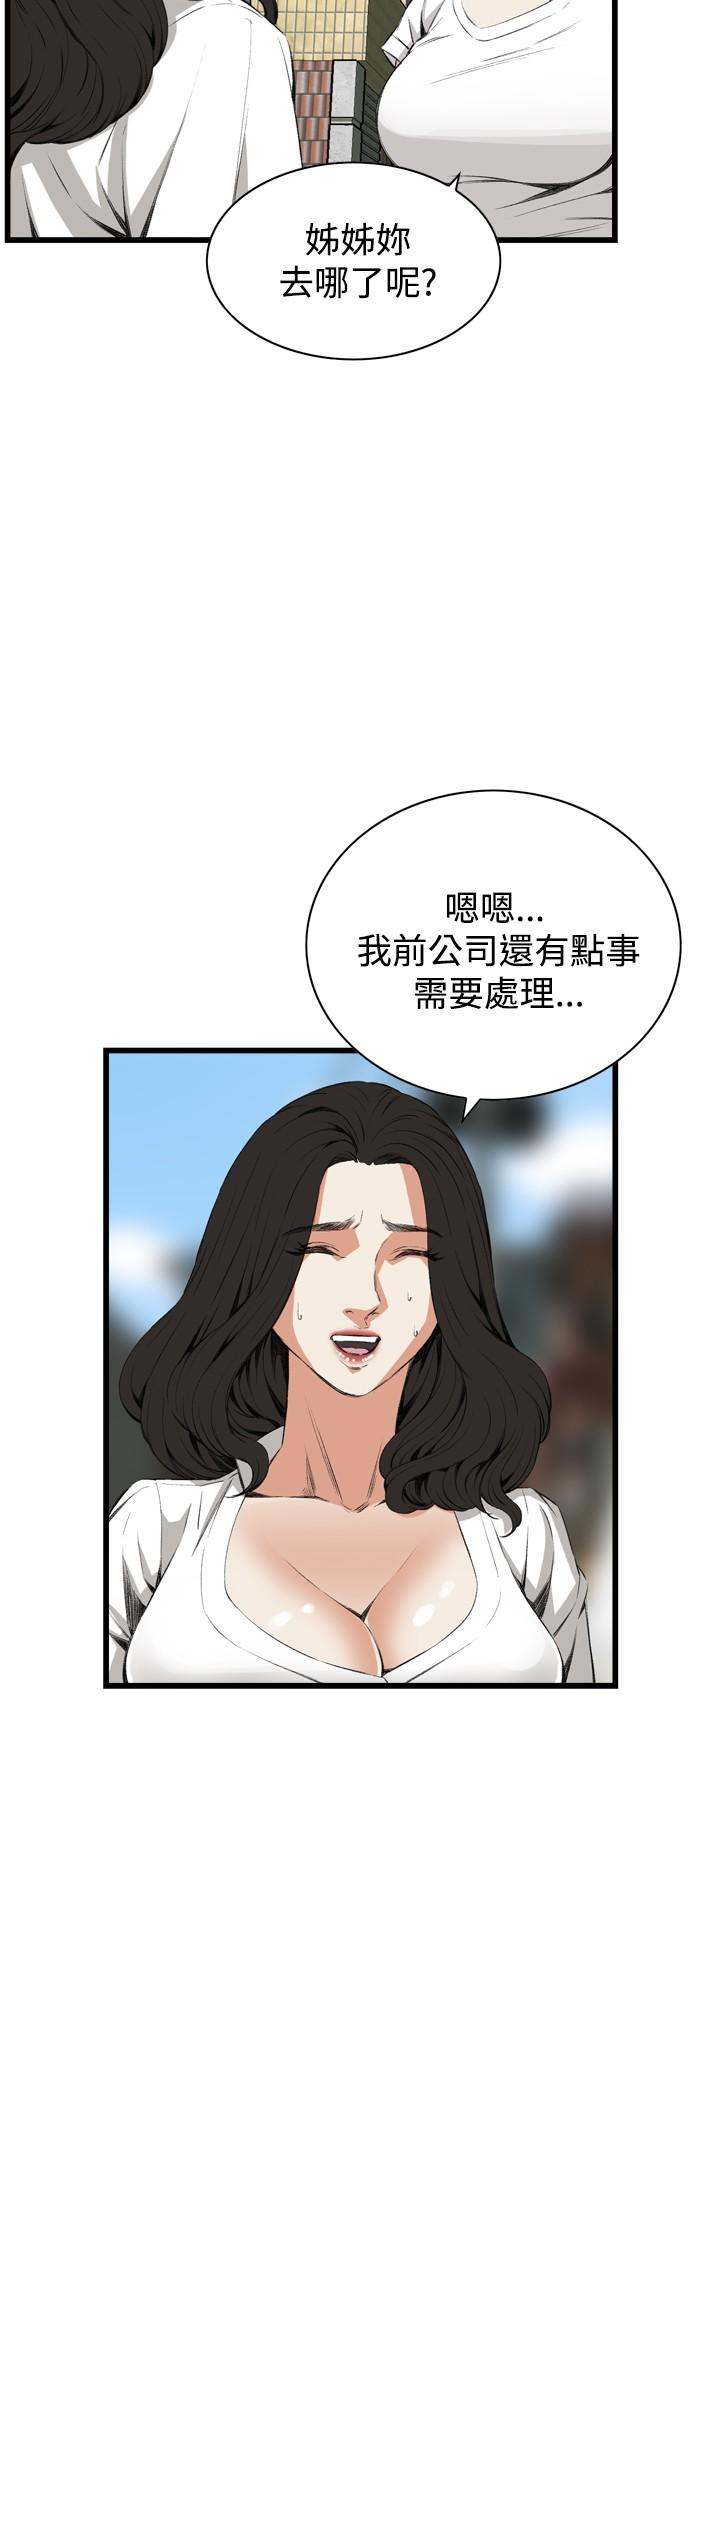 Take a Peek 偷窥 Ch.39~60 [Chinese]中文 380